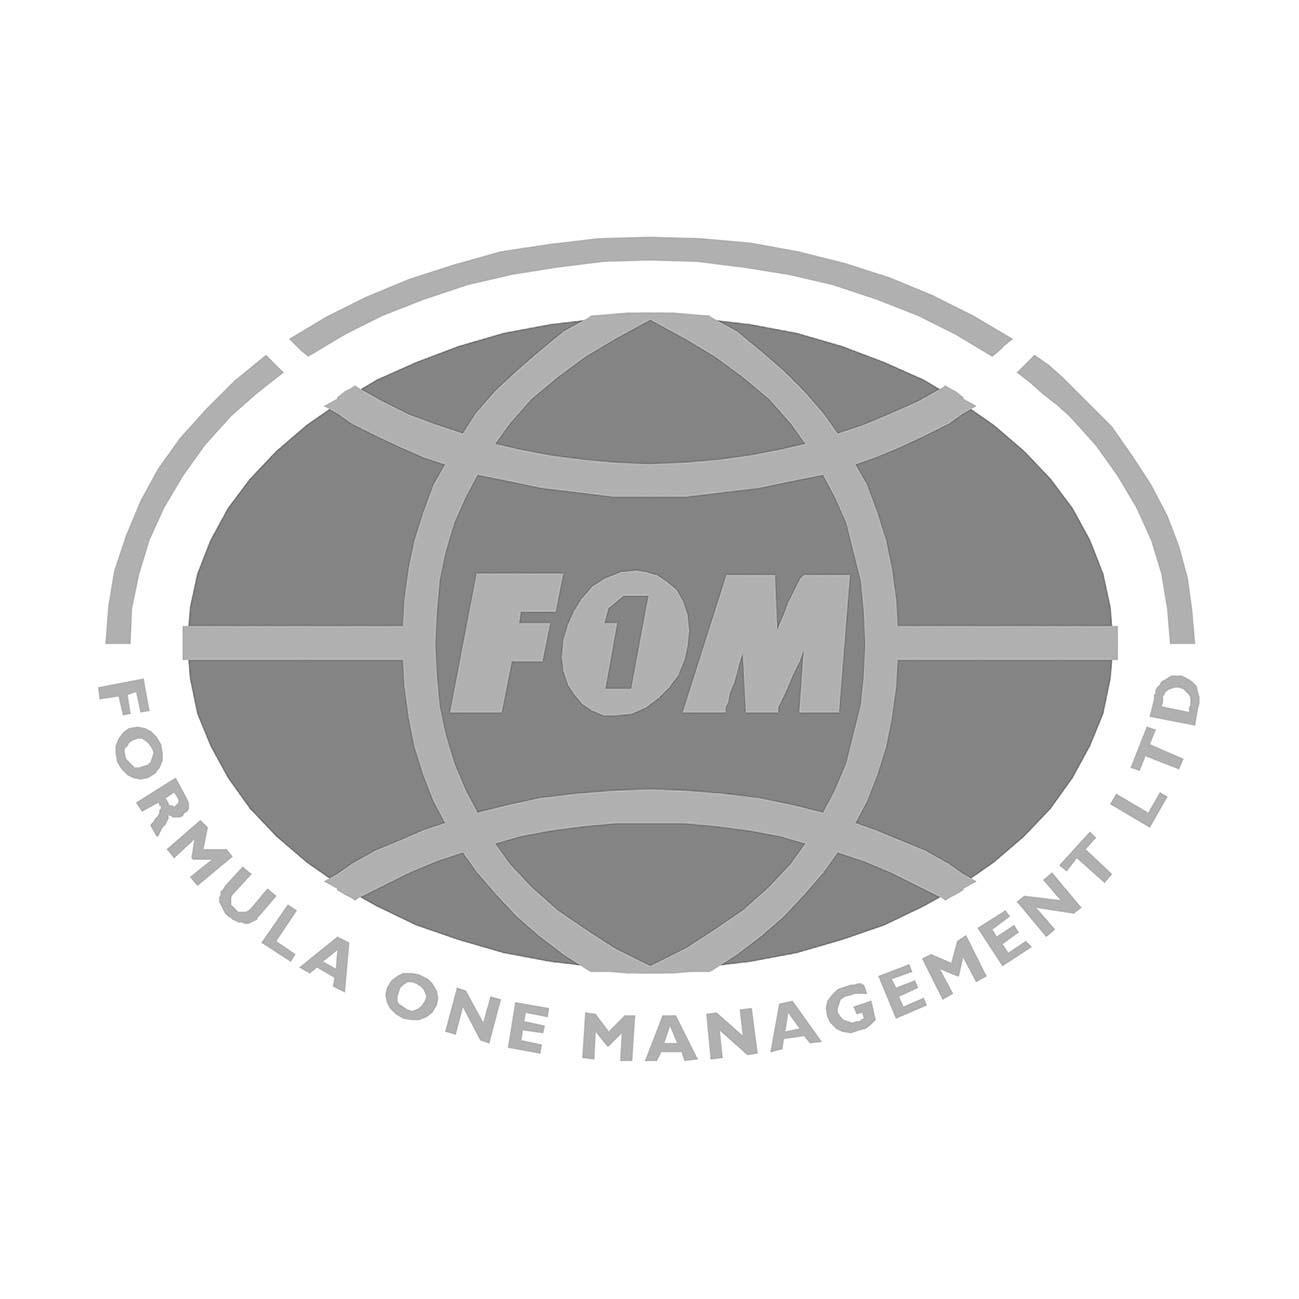 Formula One Management.jpg